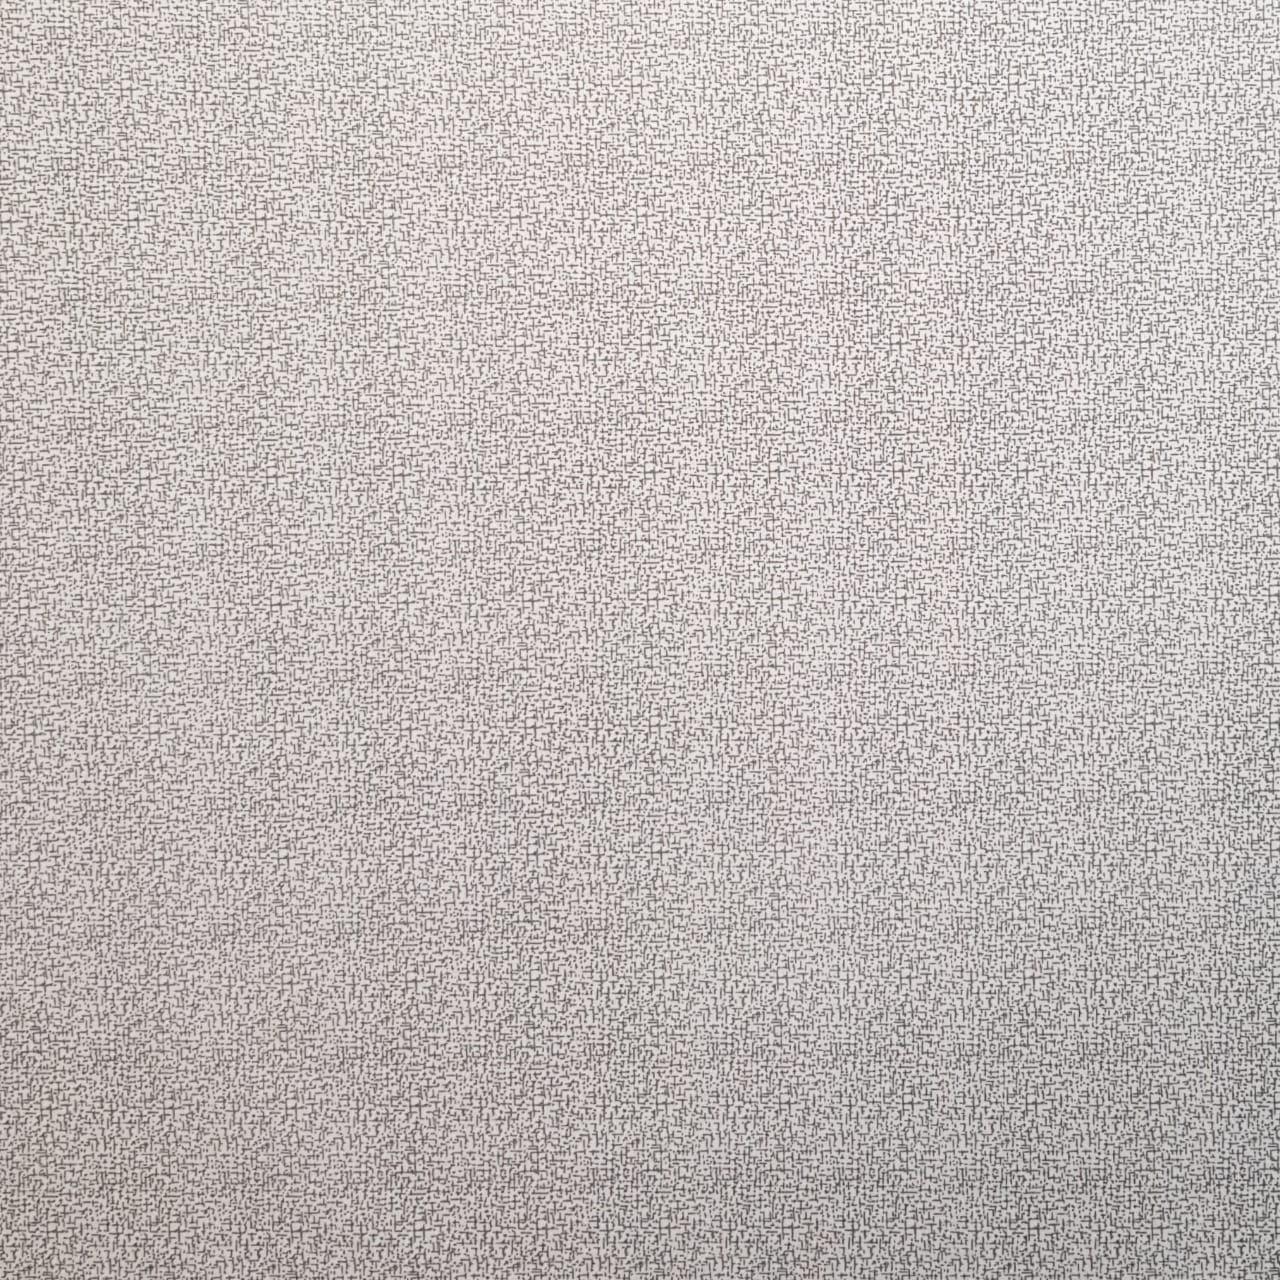 Crackelad cinza - 30x150cm